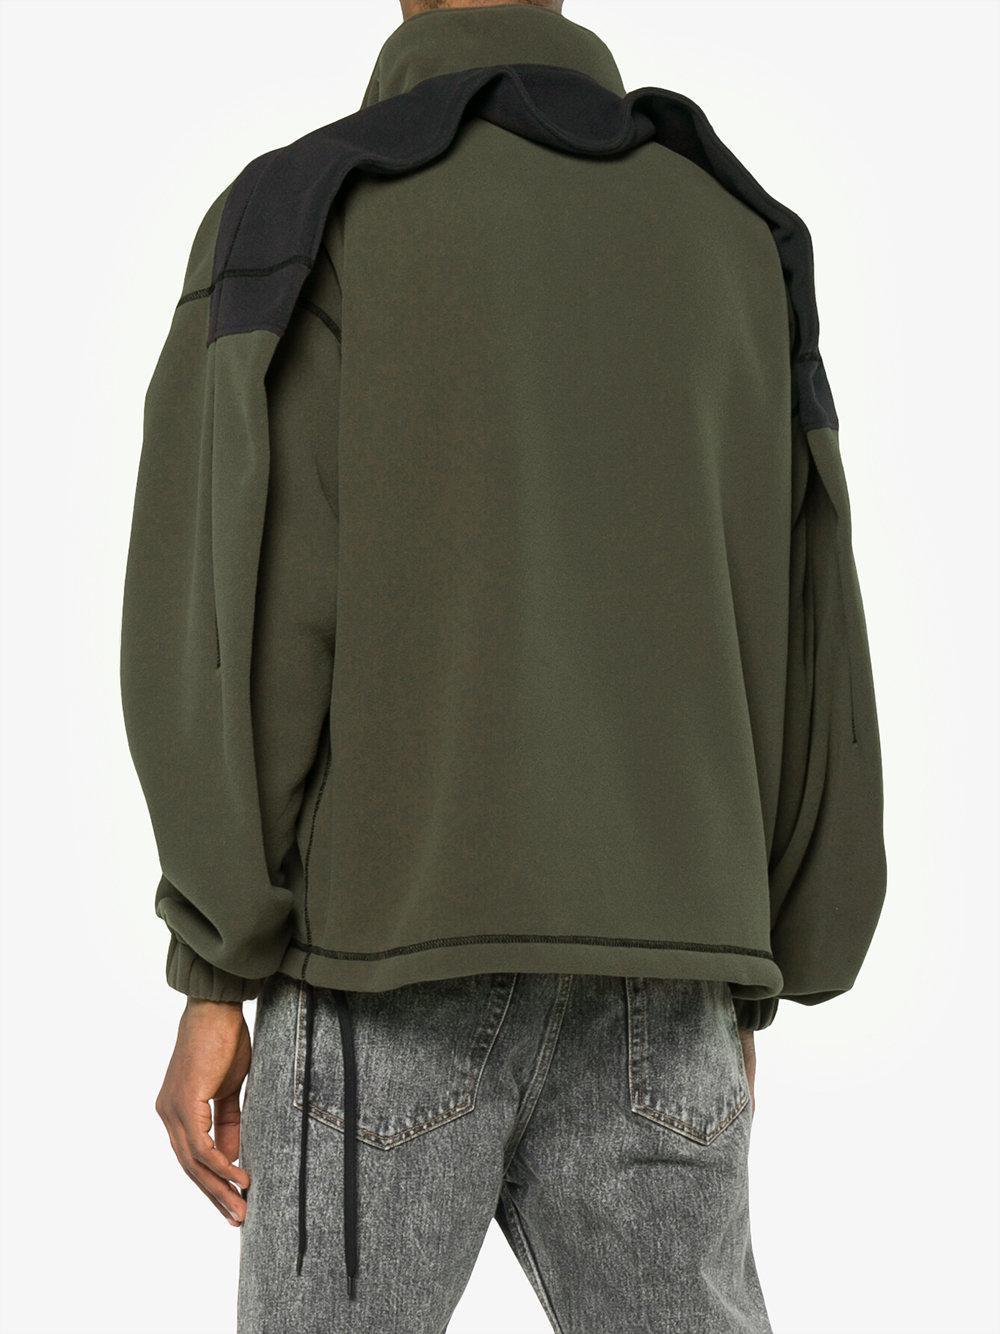 Y. Project Double Shoulder Fleece Jacket in Green for Men